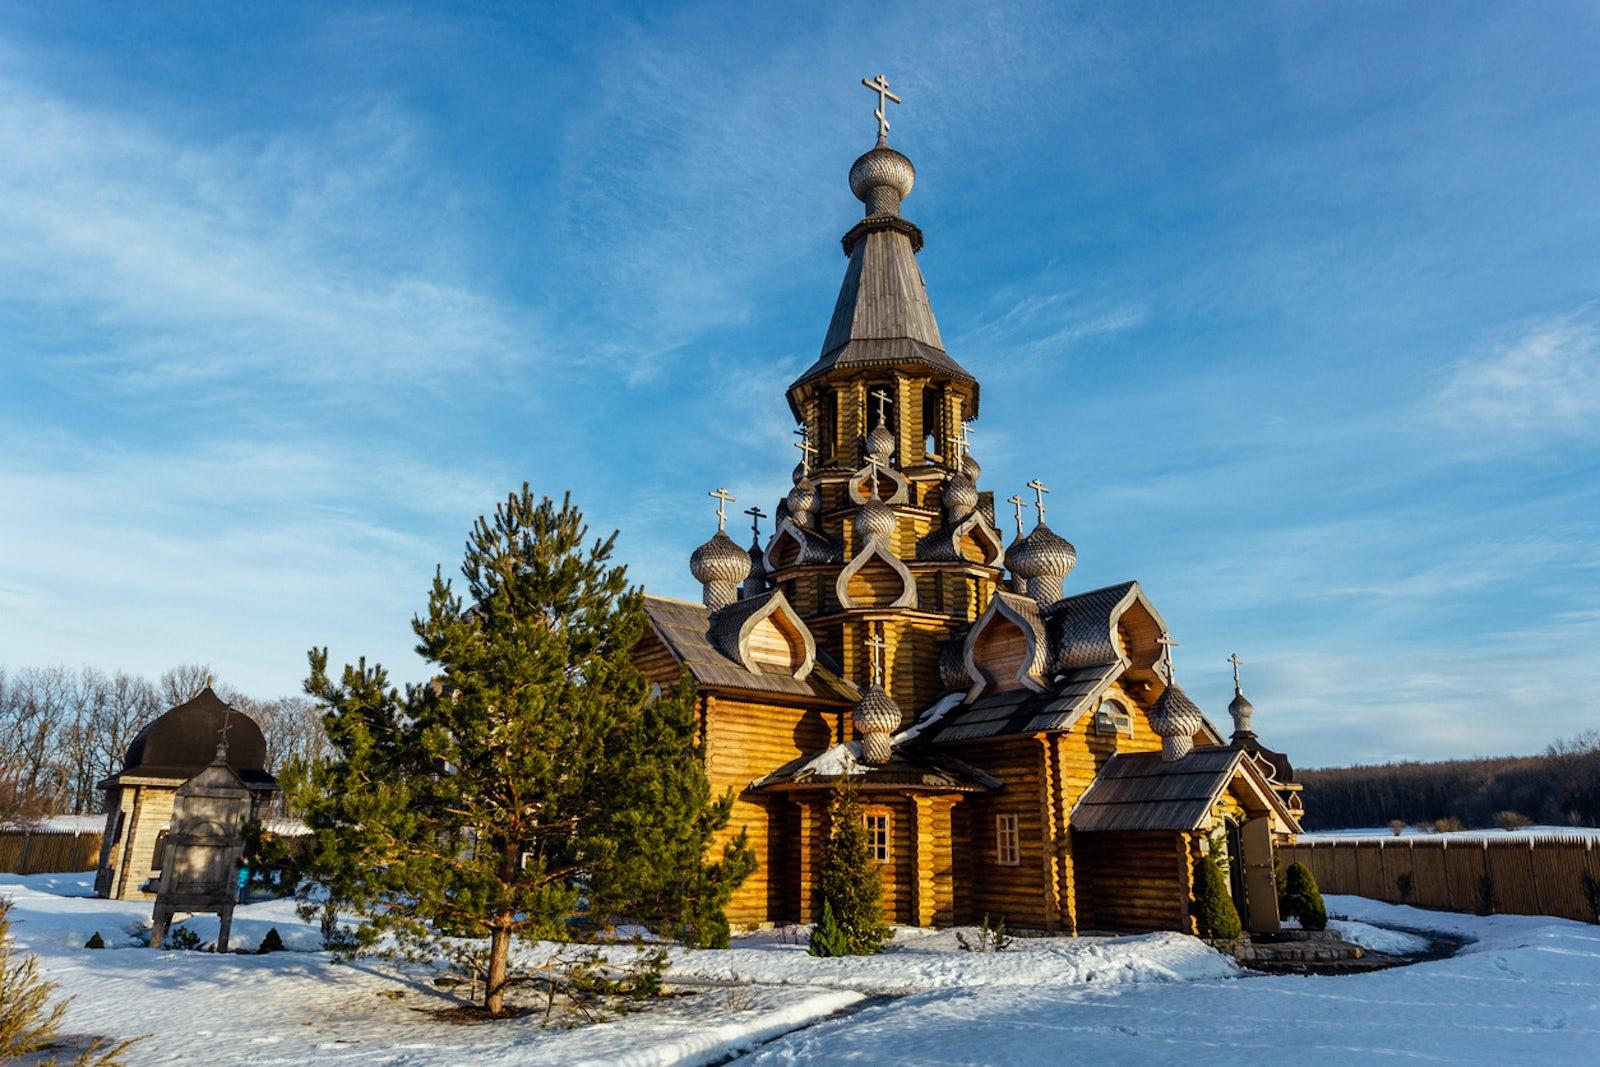 Cover photo © Credits to iStock/Vladimir Zapletin